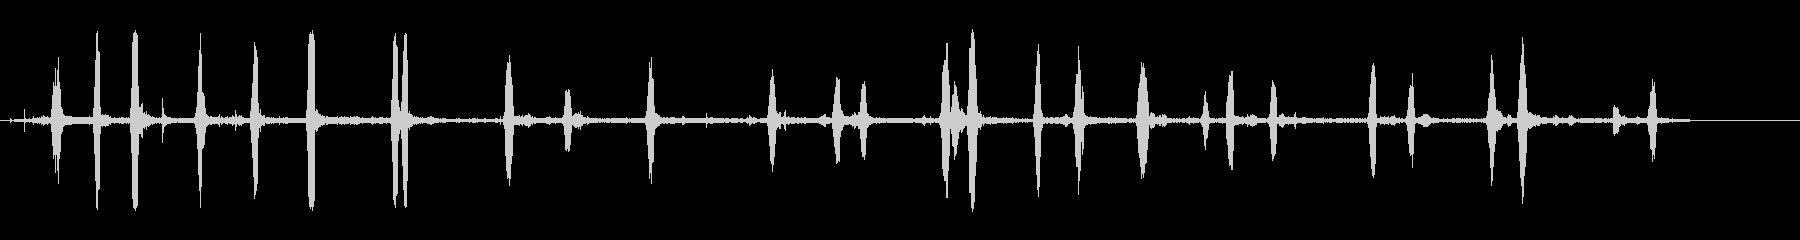 martmart -martinetの未再生の波形